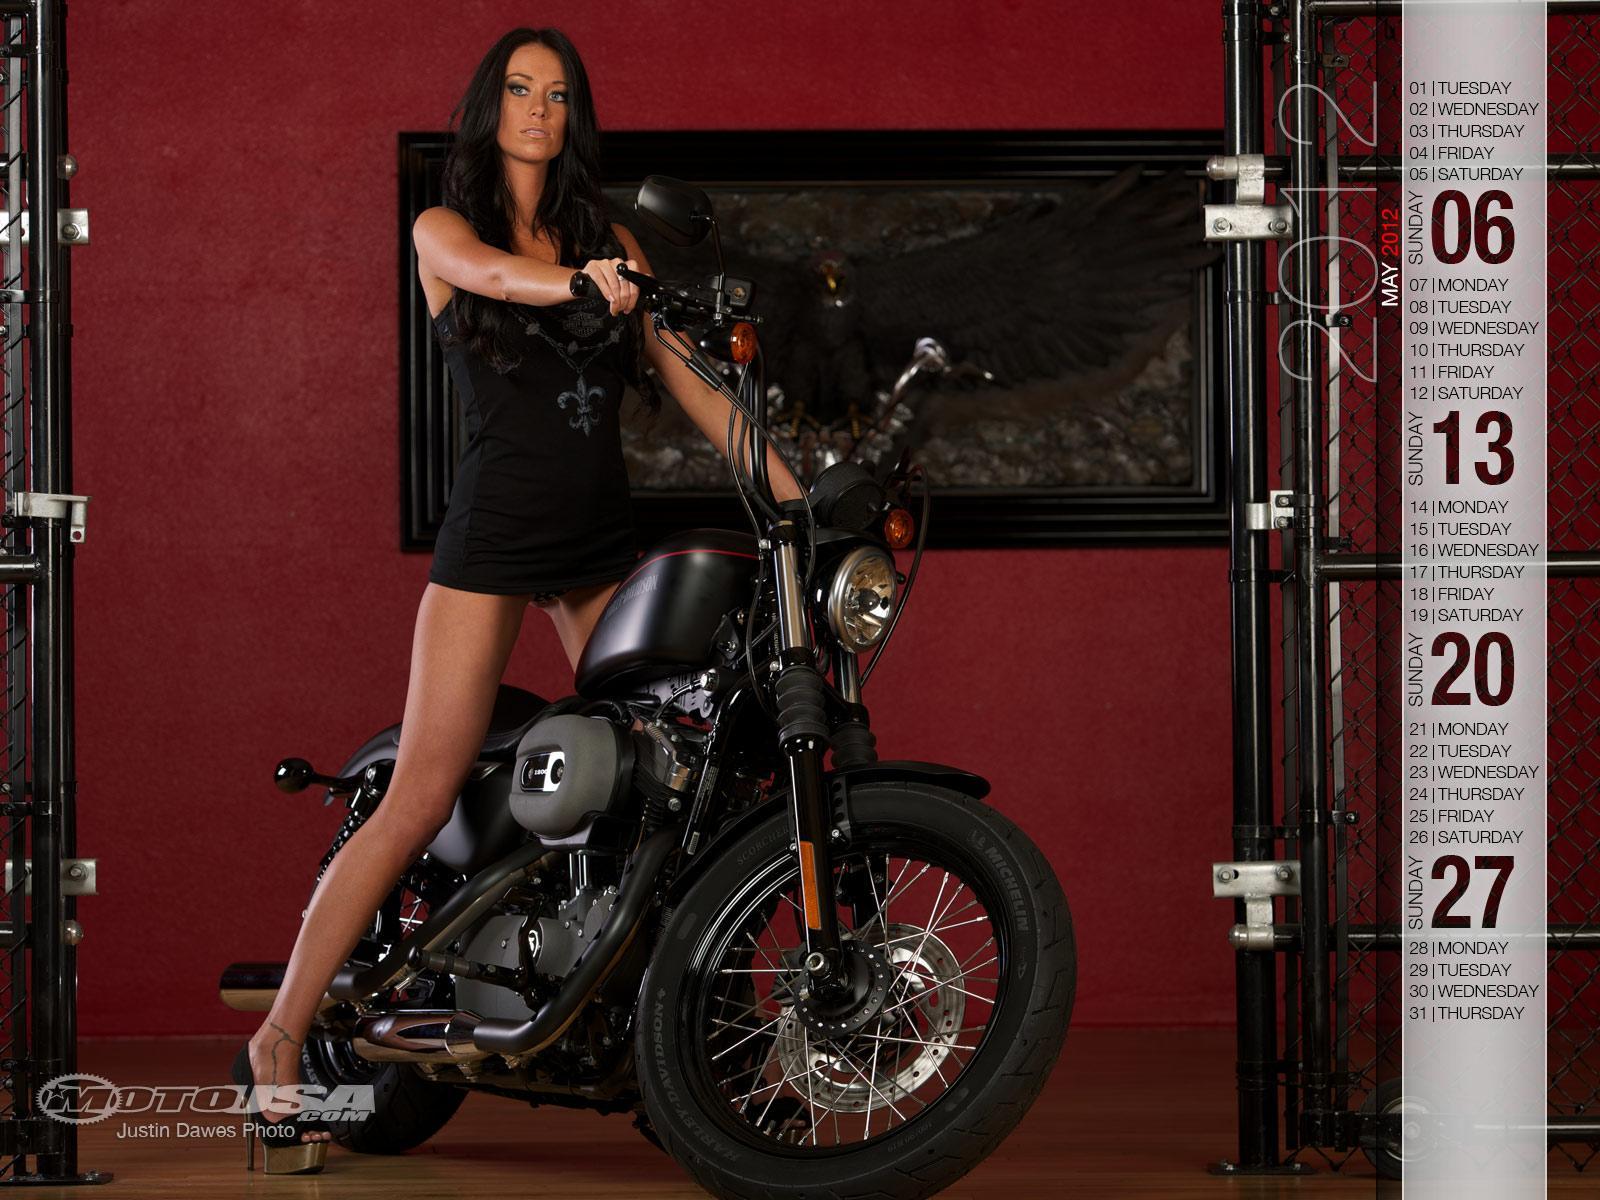 Harley Davidson Pin Up Calendar httpwwwmotorcycle usacom19171 1600x1200